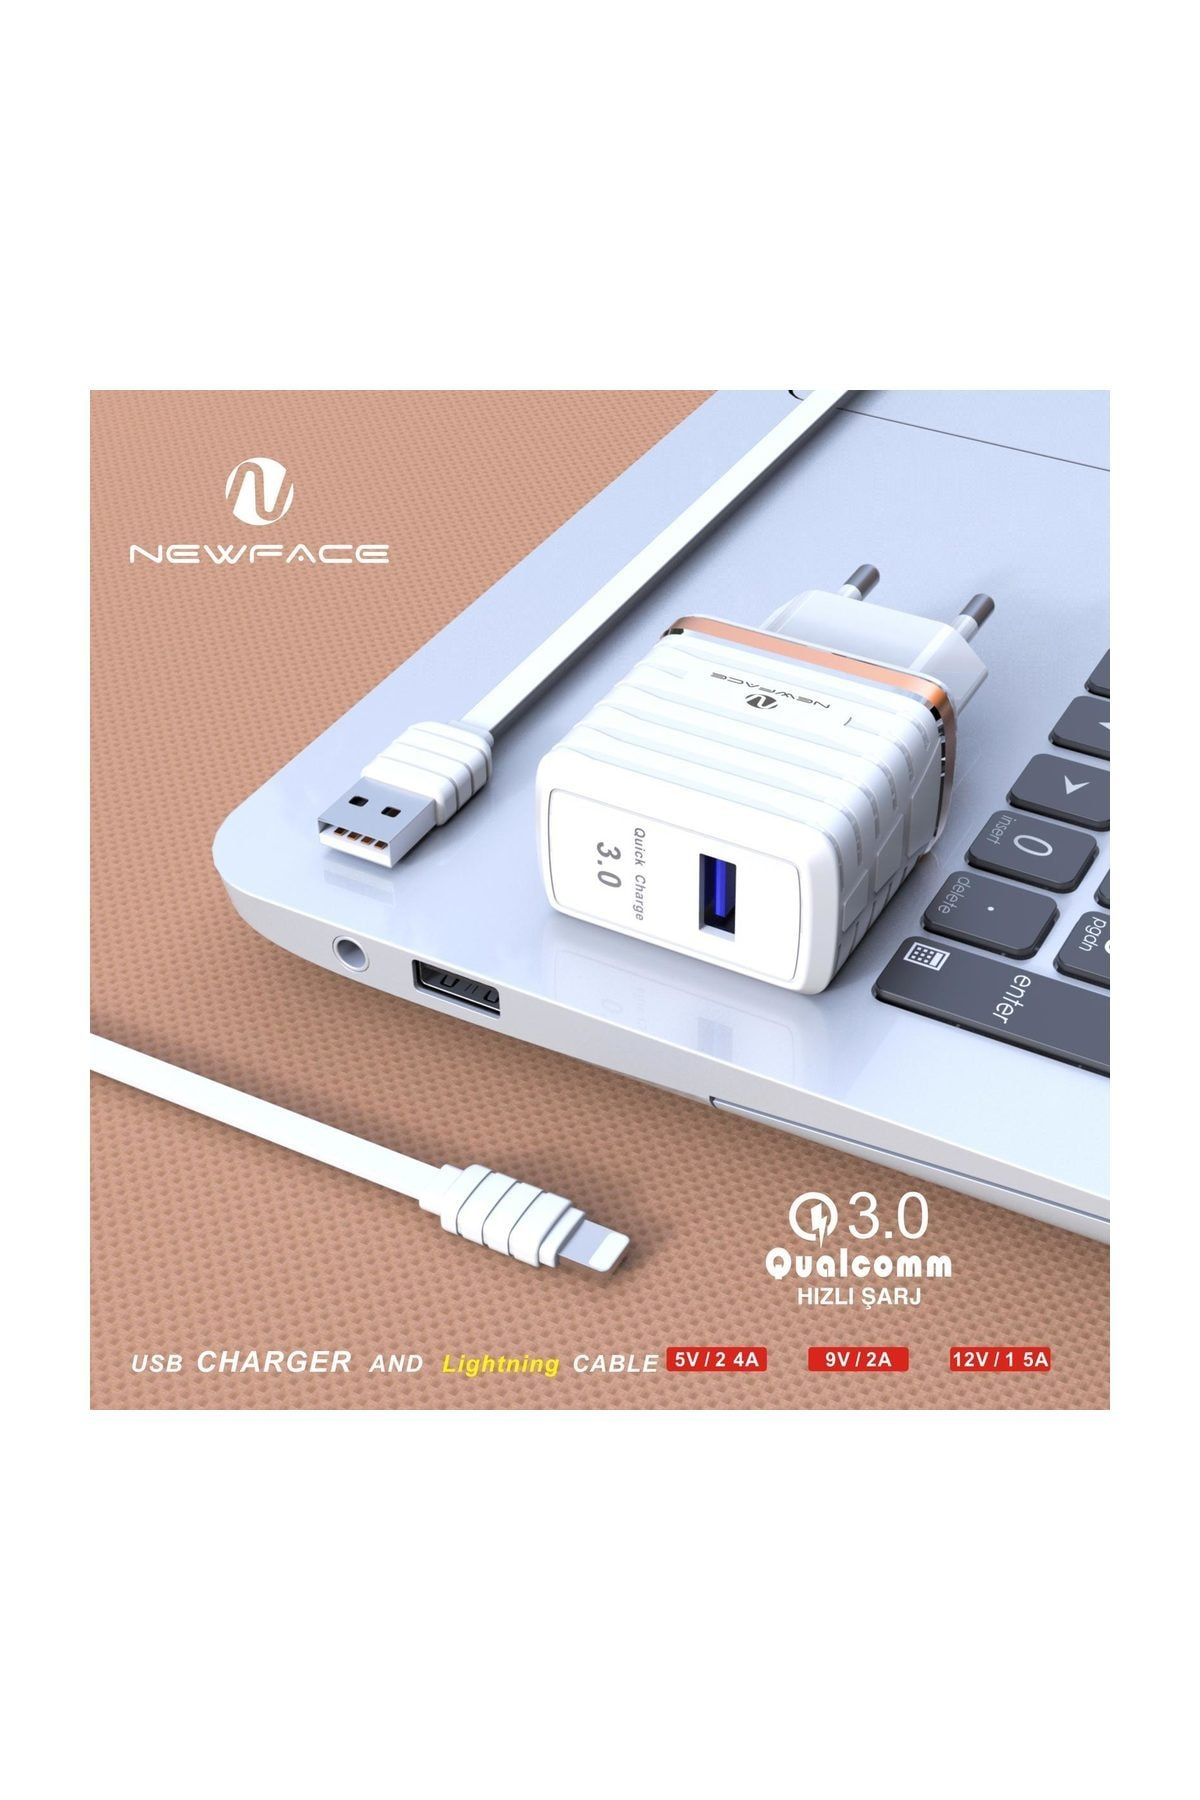 NewFace Apple Ipad Lightning Hızlı Şarj Aleti Seti Qualcomm 3.0a 2